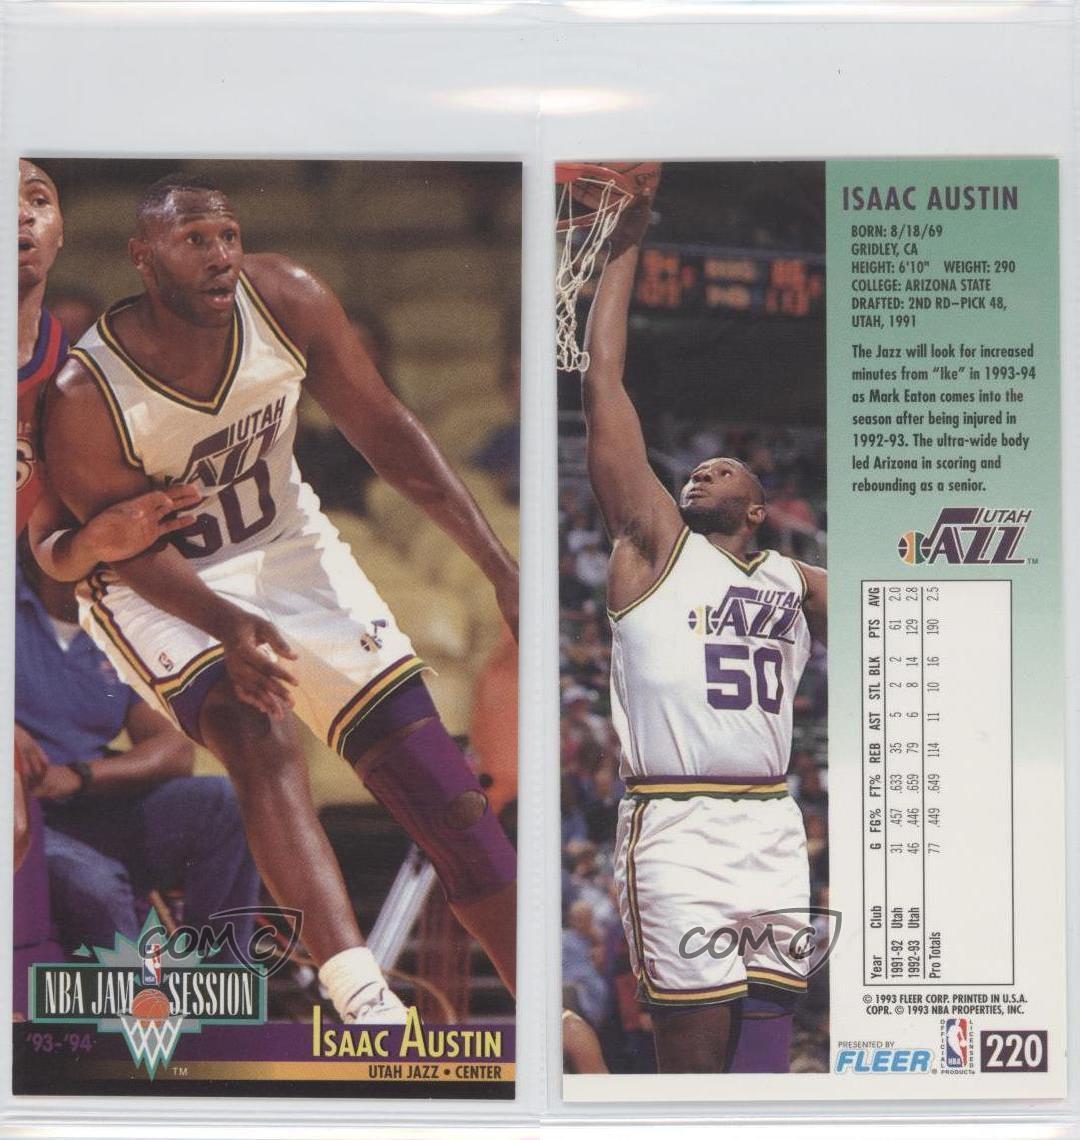 1993-94 NBA Jam Session #220 Isaac Austin Utah Jazz